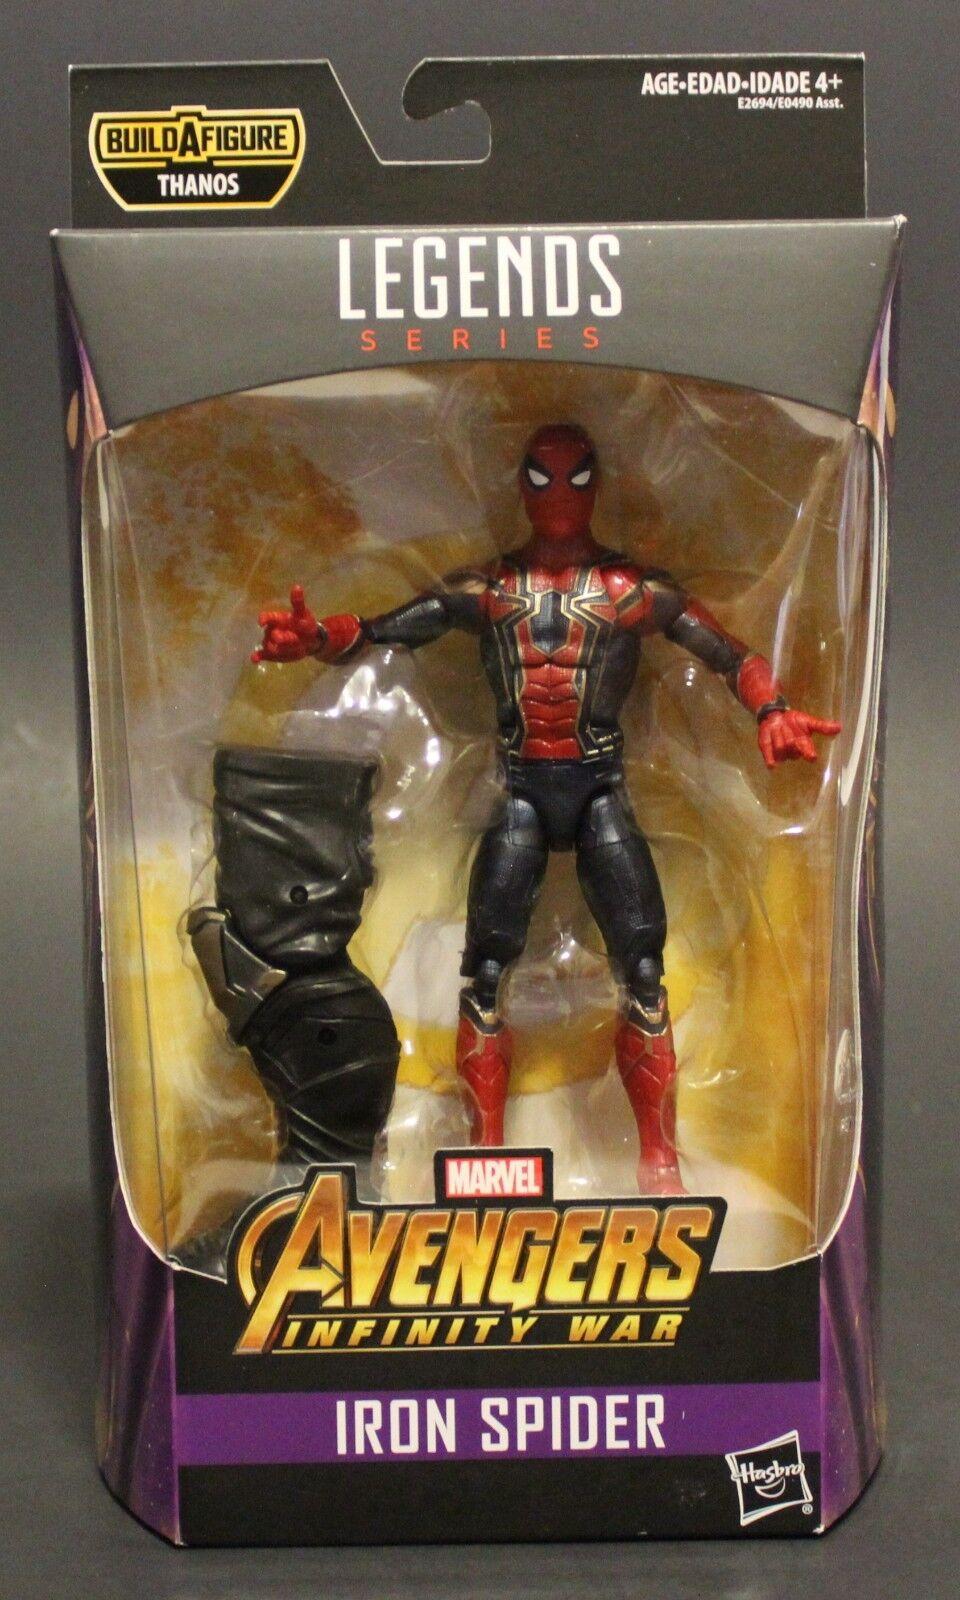 2018 Hasbro Marvel Legends 6  IRON SPIDER THANOS BAF figure Avengers Infinity Wa